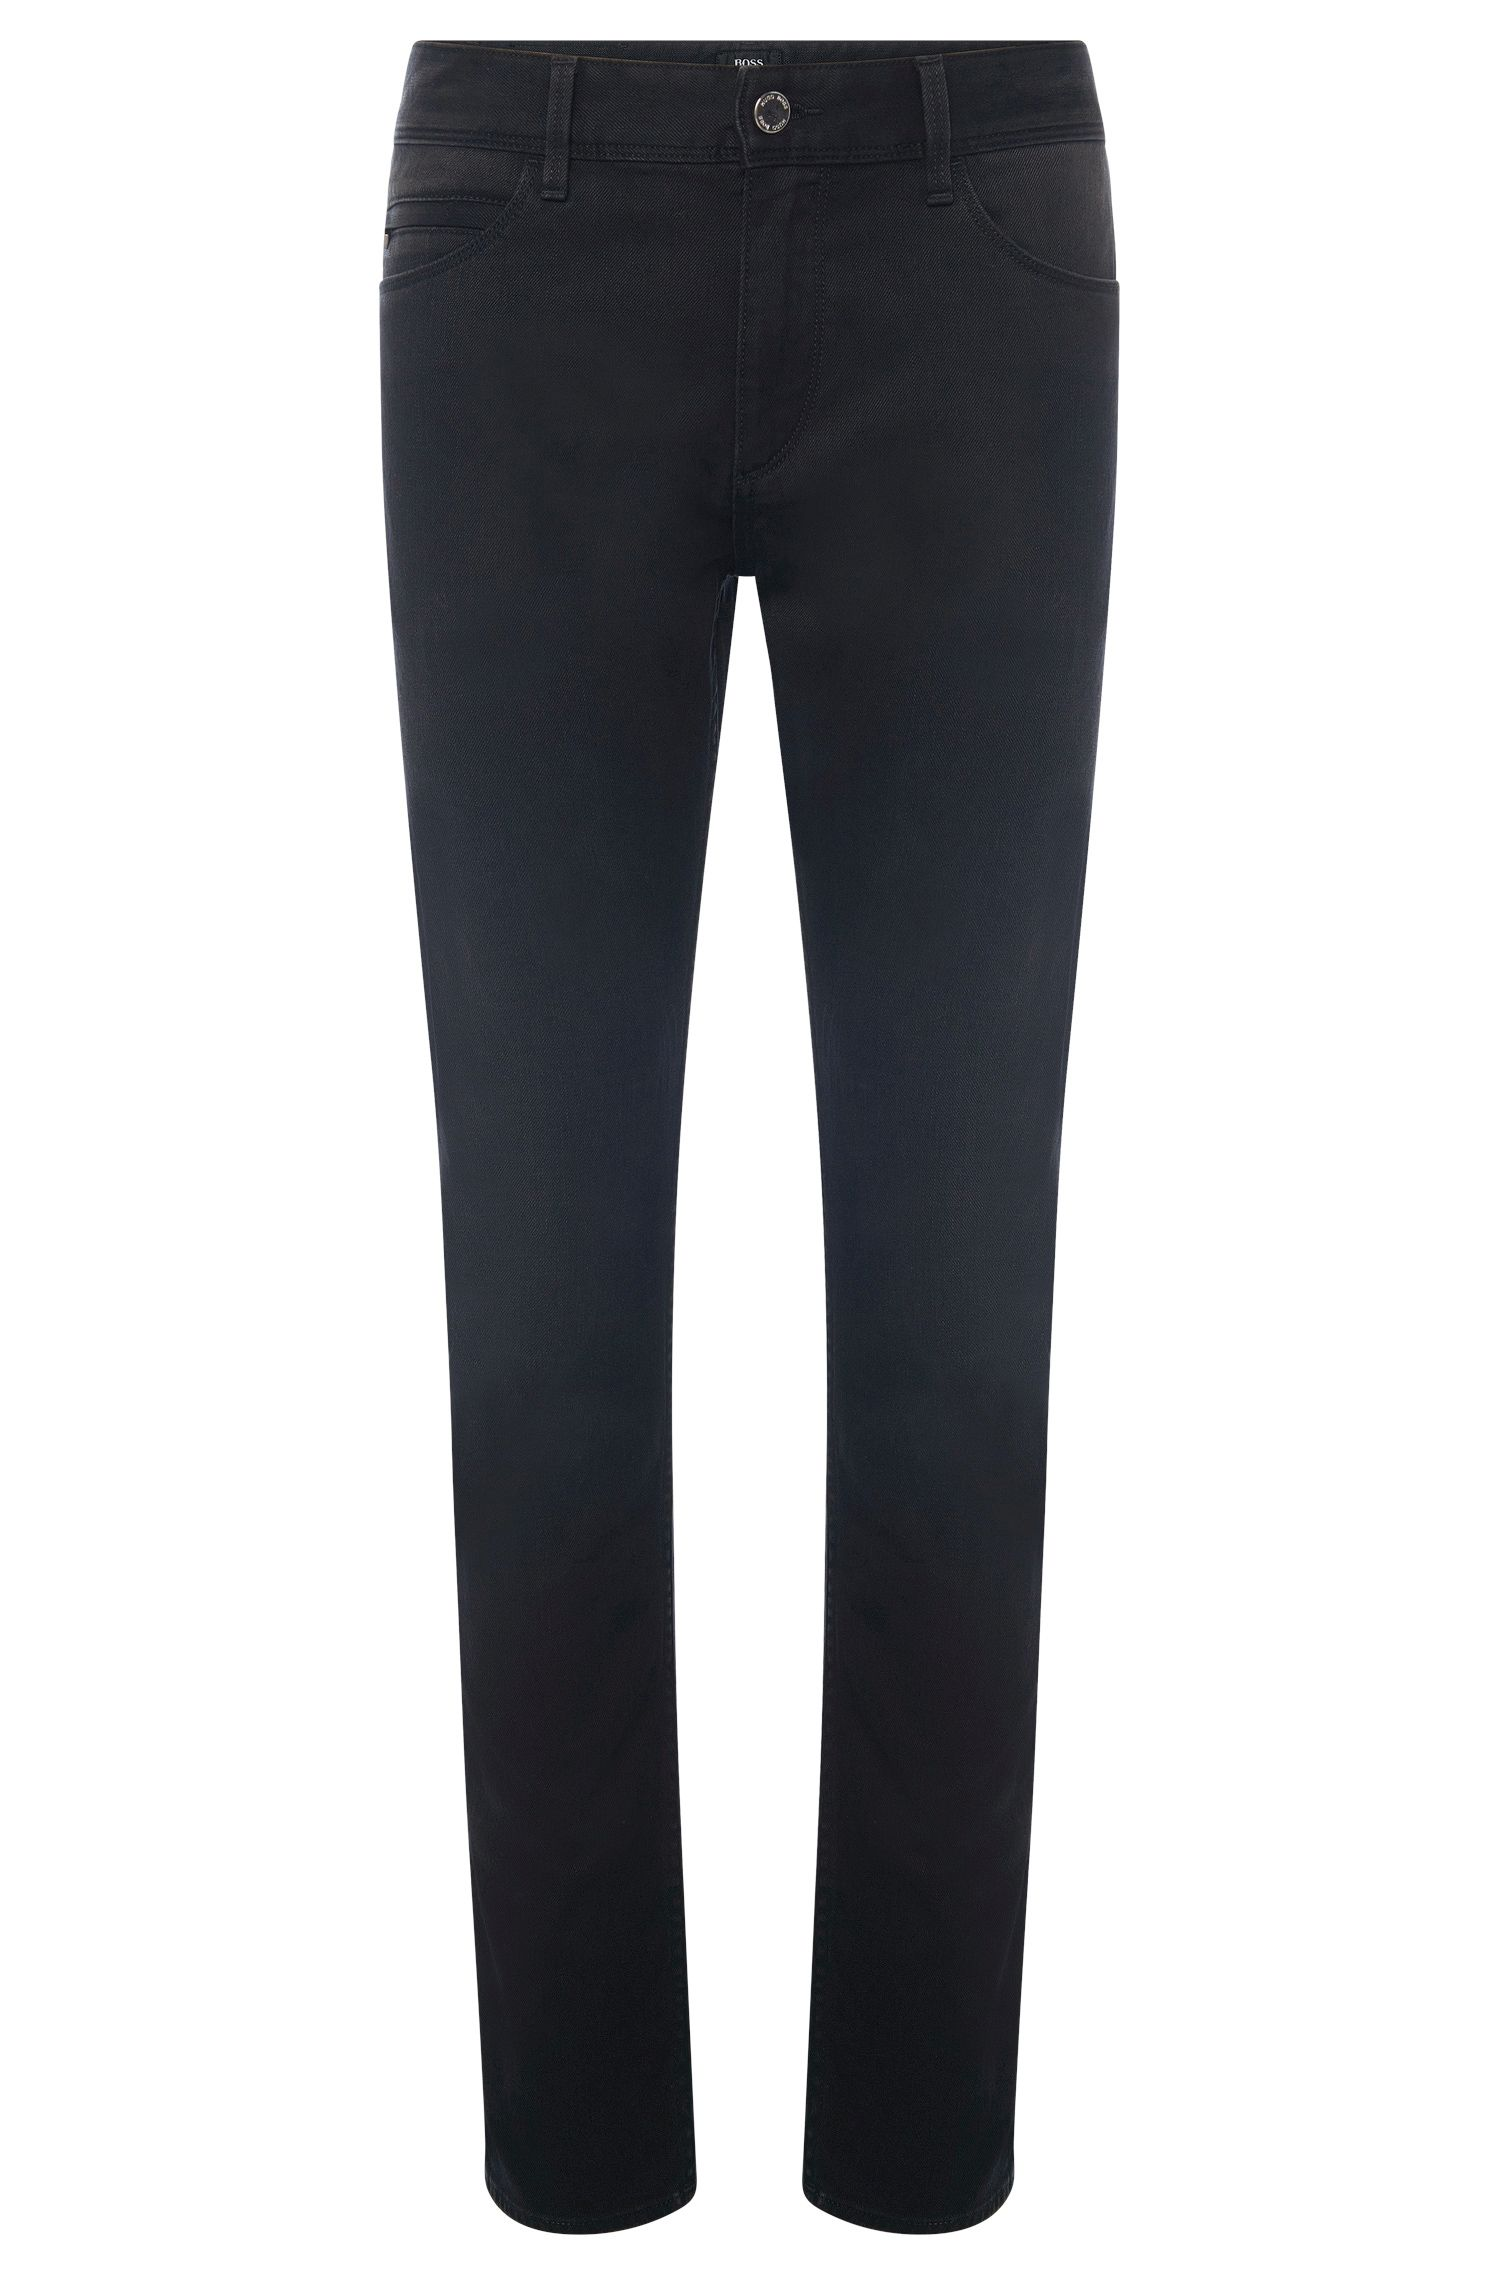 10 oz Stretch Cotton Jeans, Slim Fit | Delaware